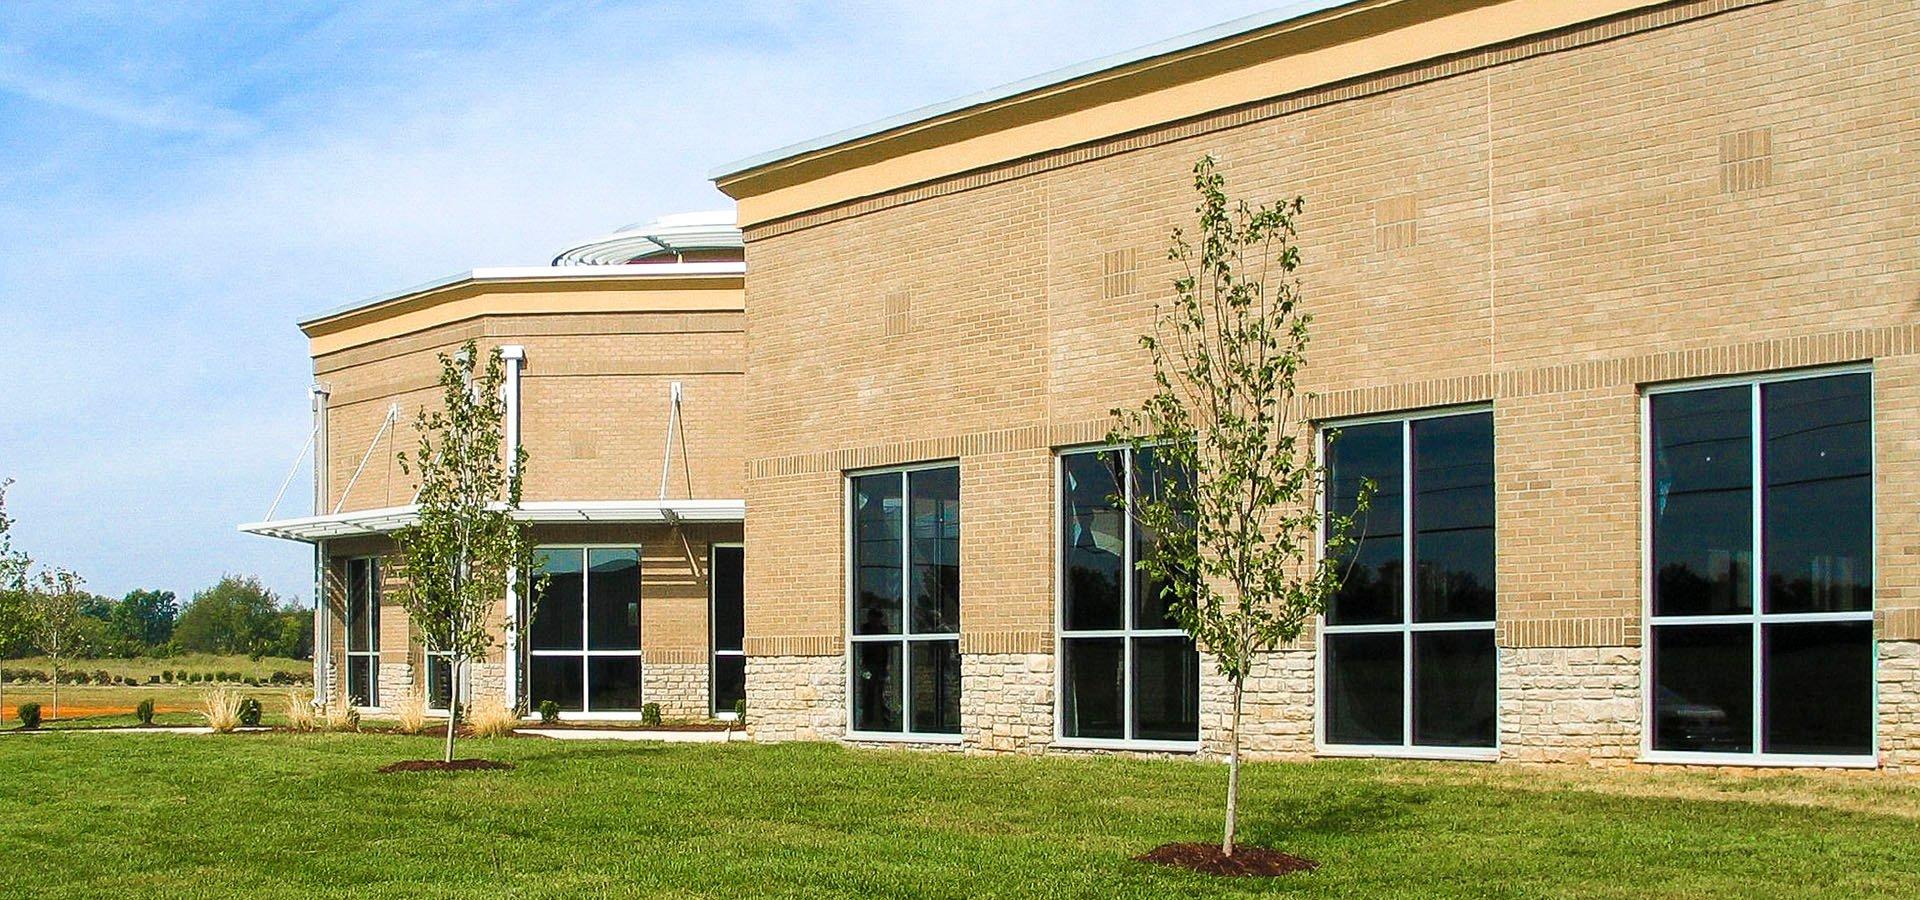 Dr. Eli Jackson | Bowling Green, Kentucky | Brindley Construction, LLC.